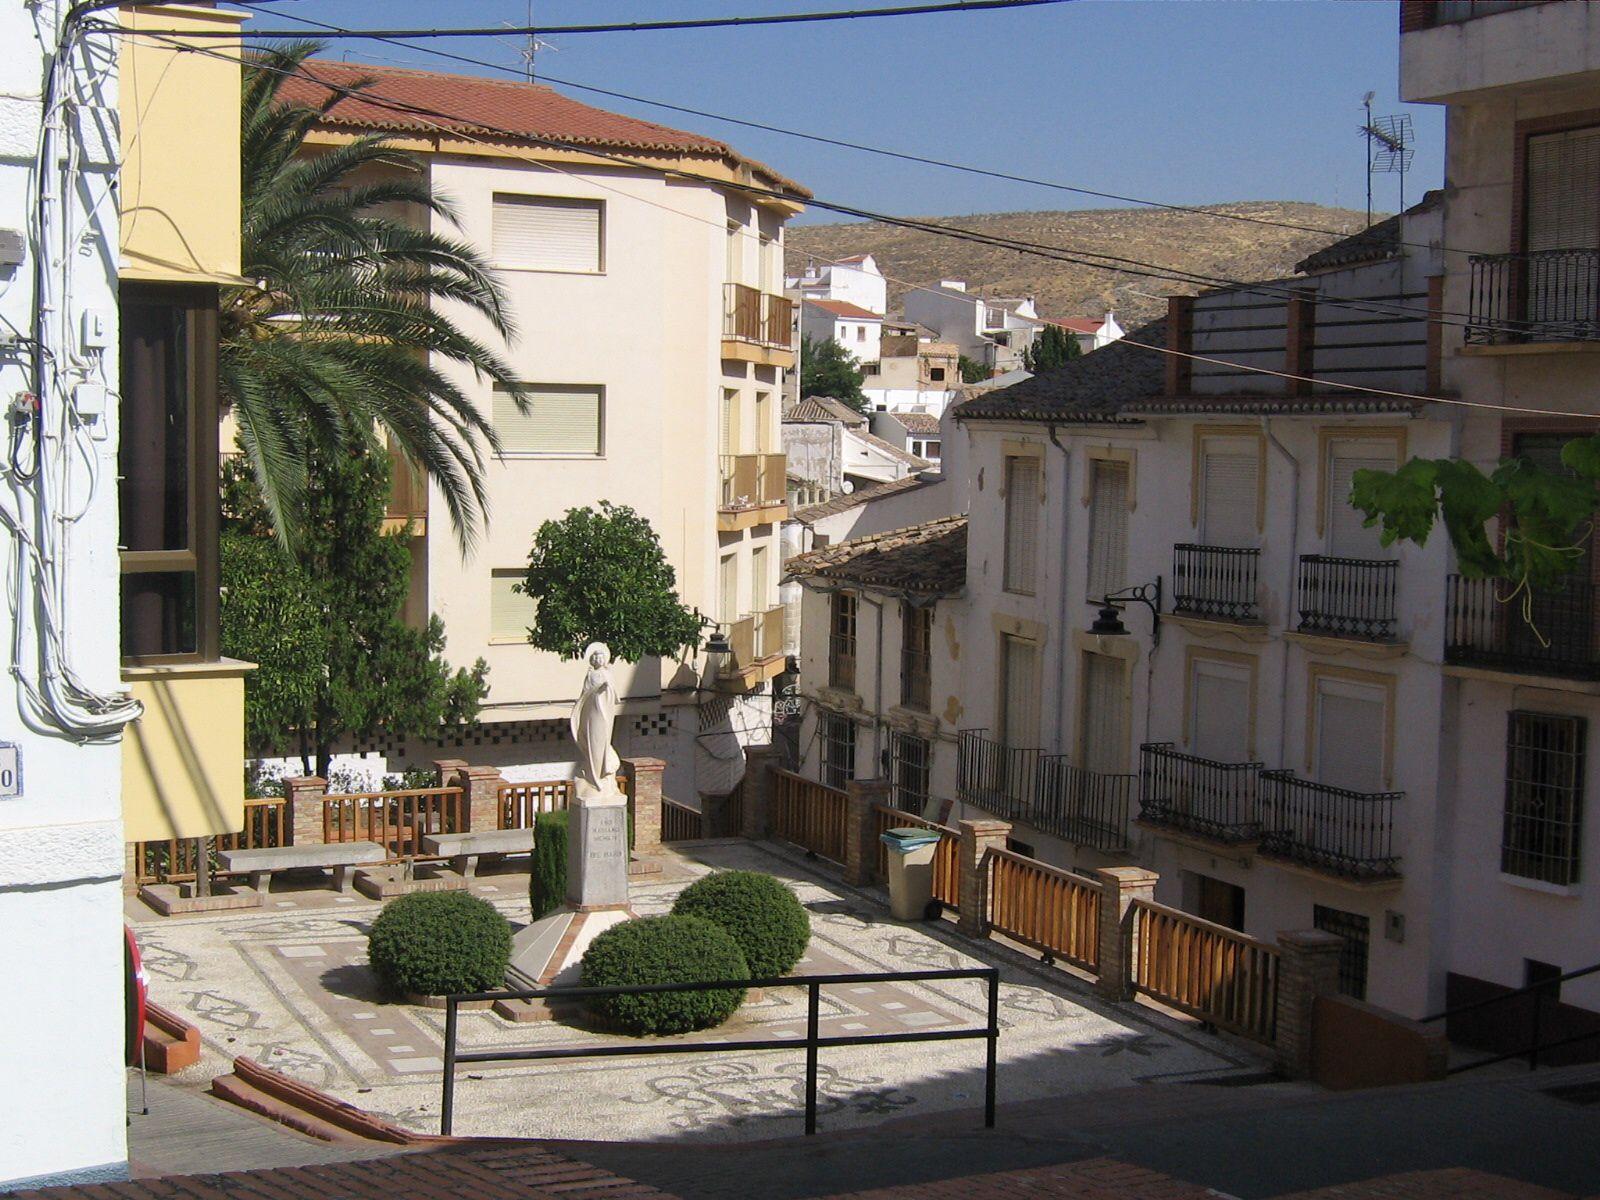 Orte zum Abnehmen in Cordoba